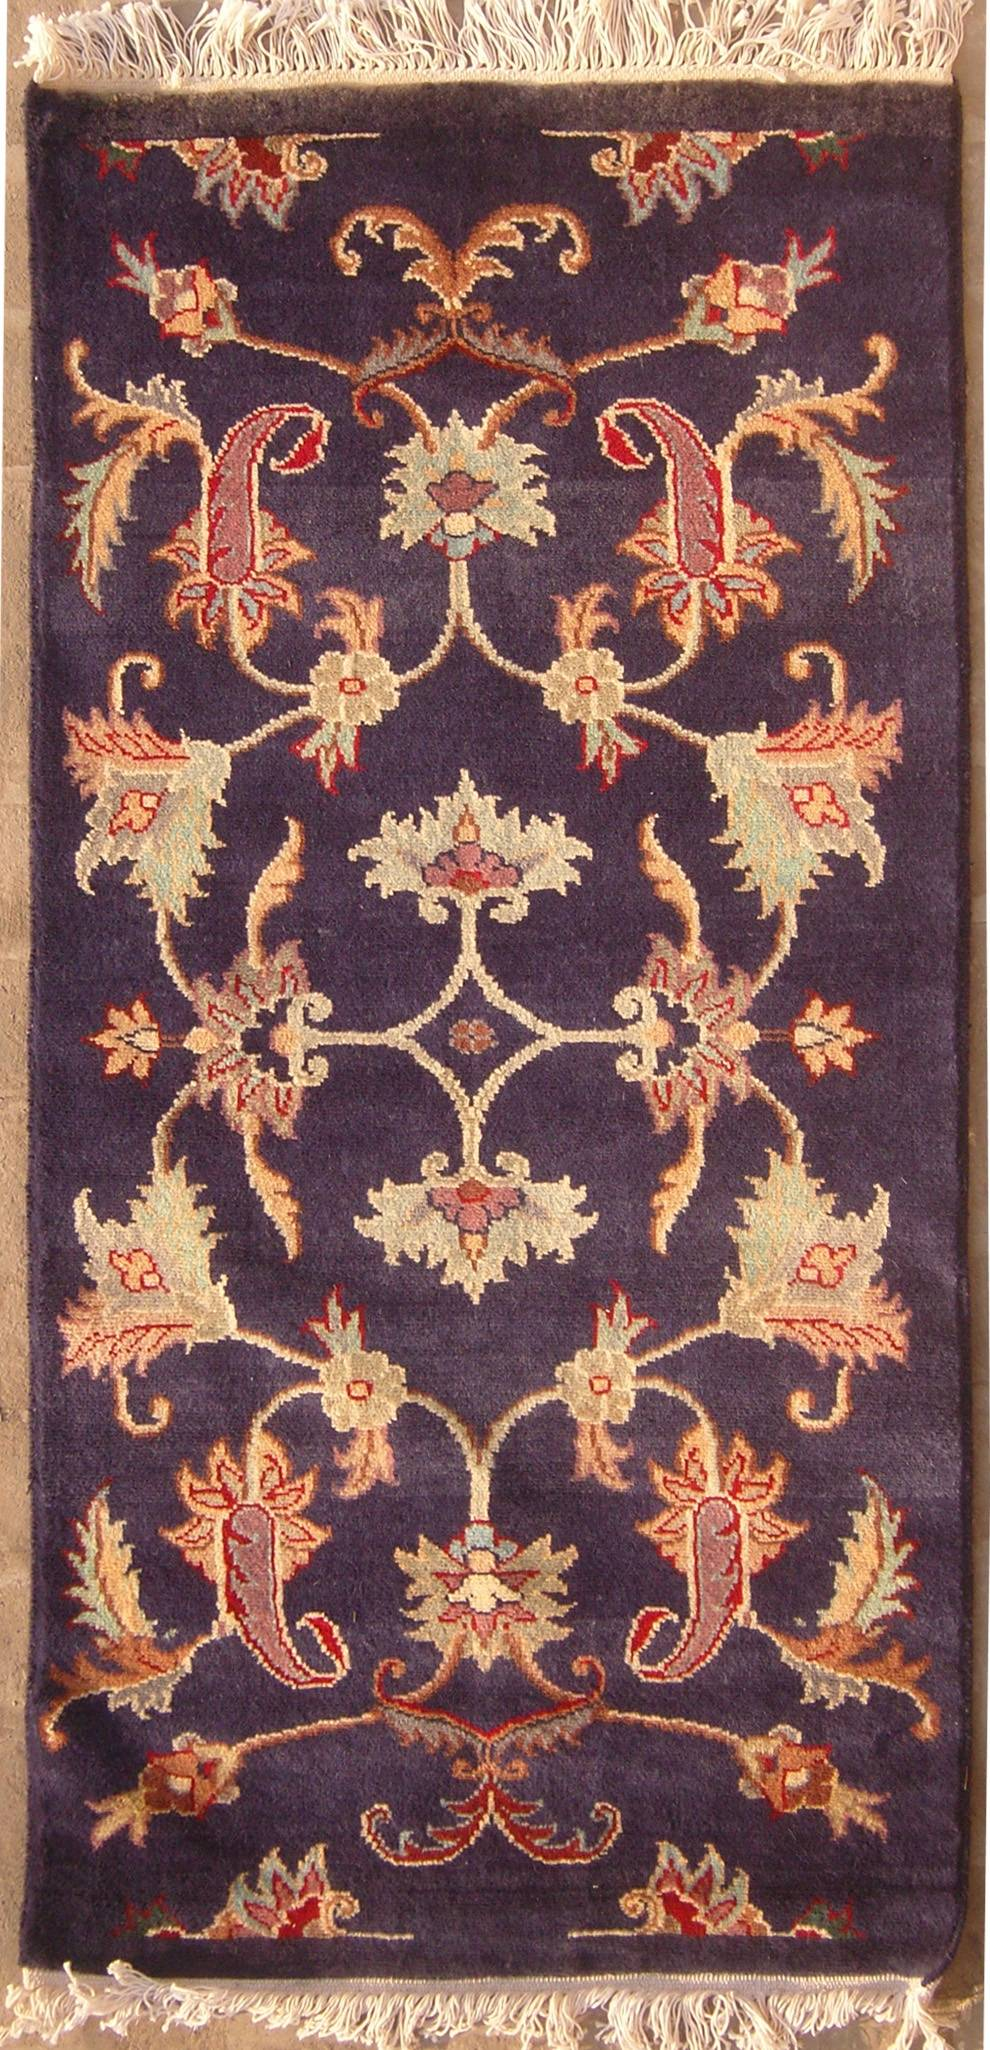 5x4'7 rug - floral - handmade pak persian high quality rugs - a